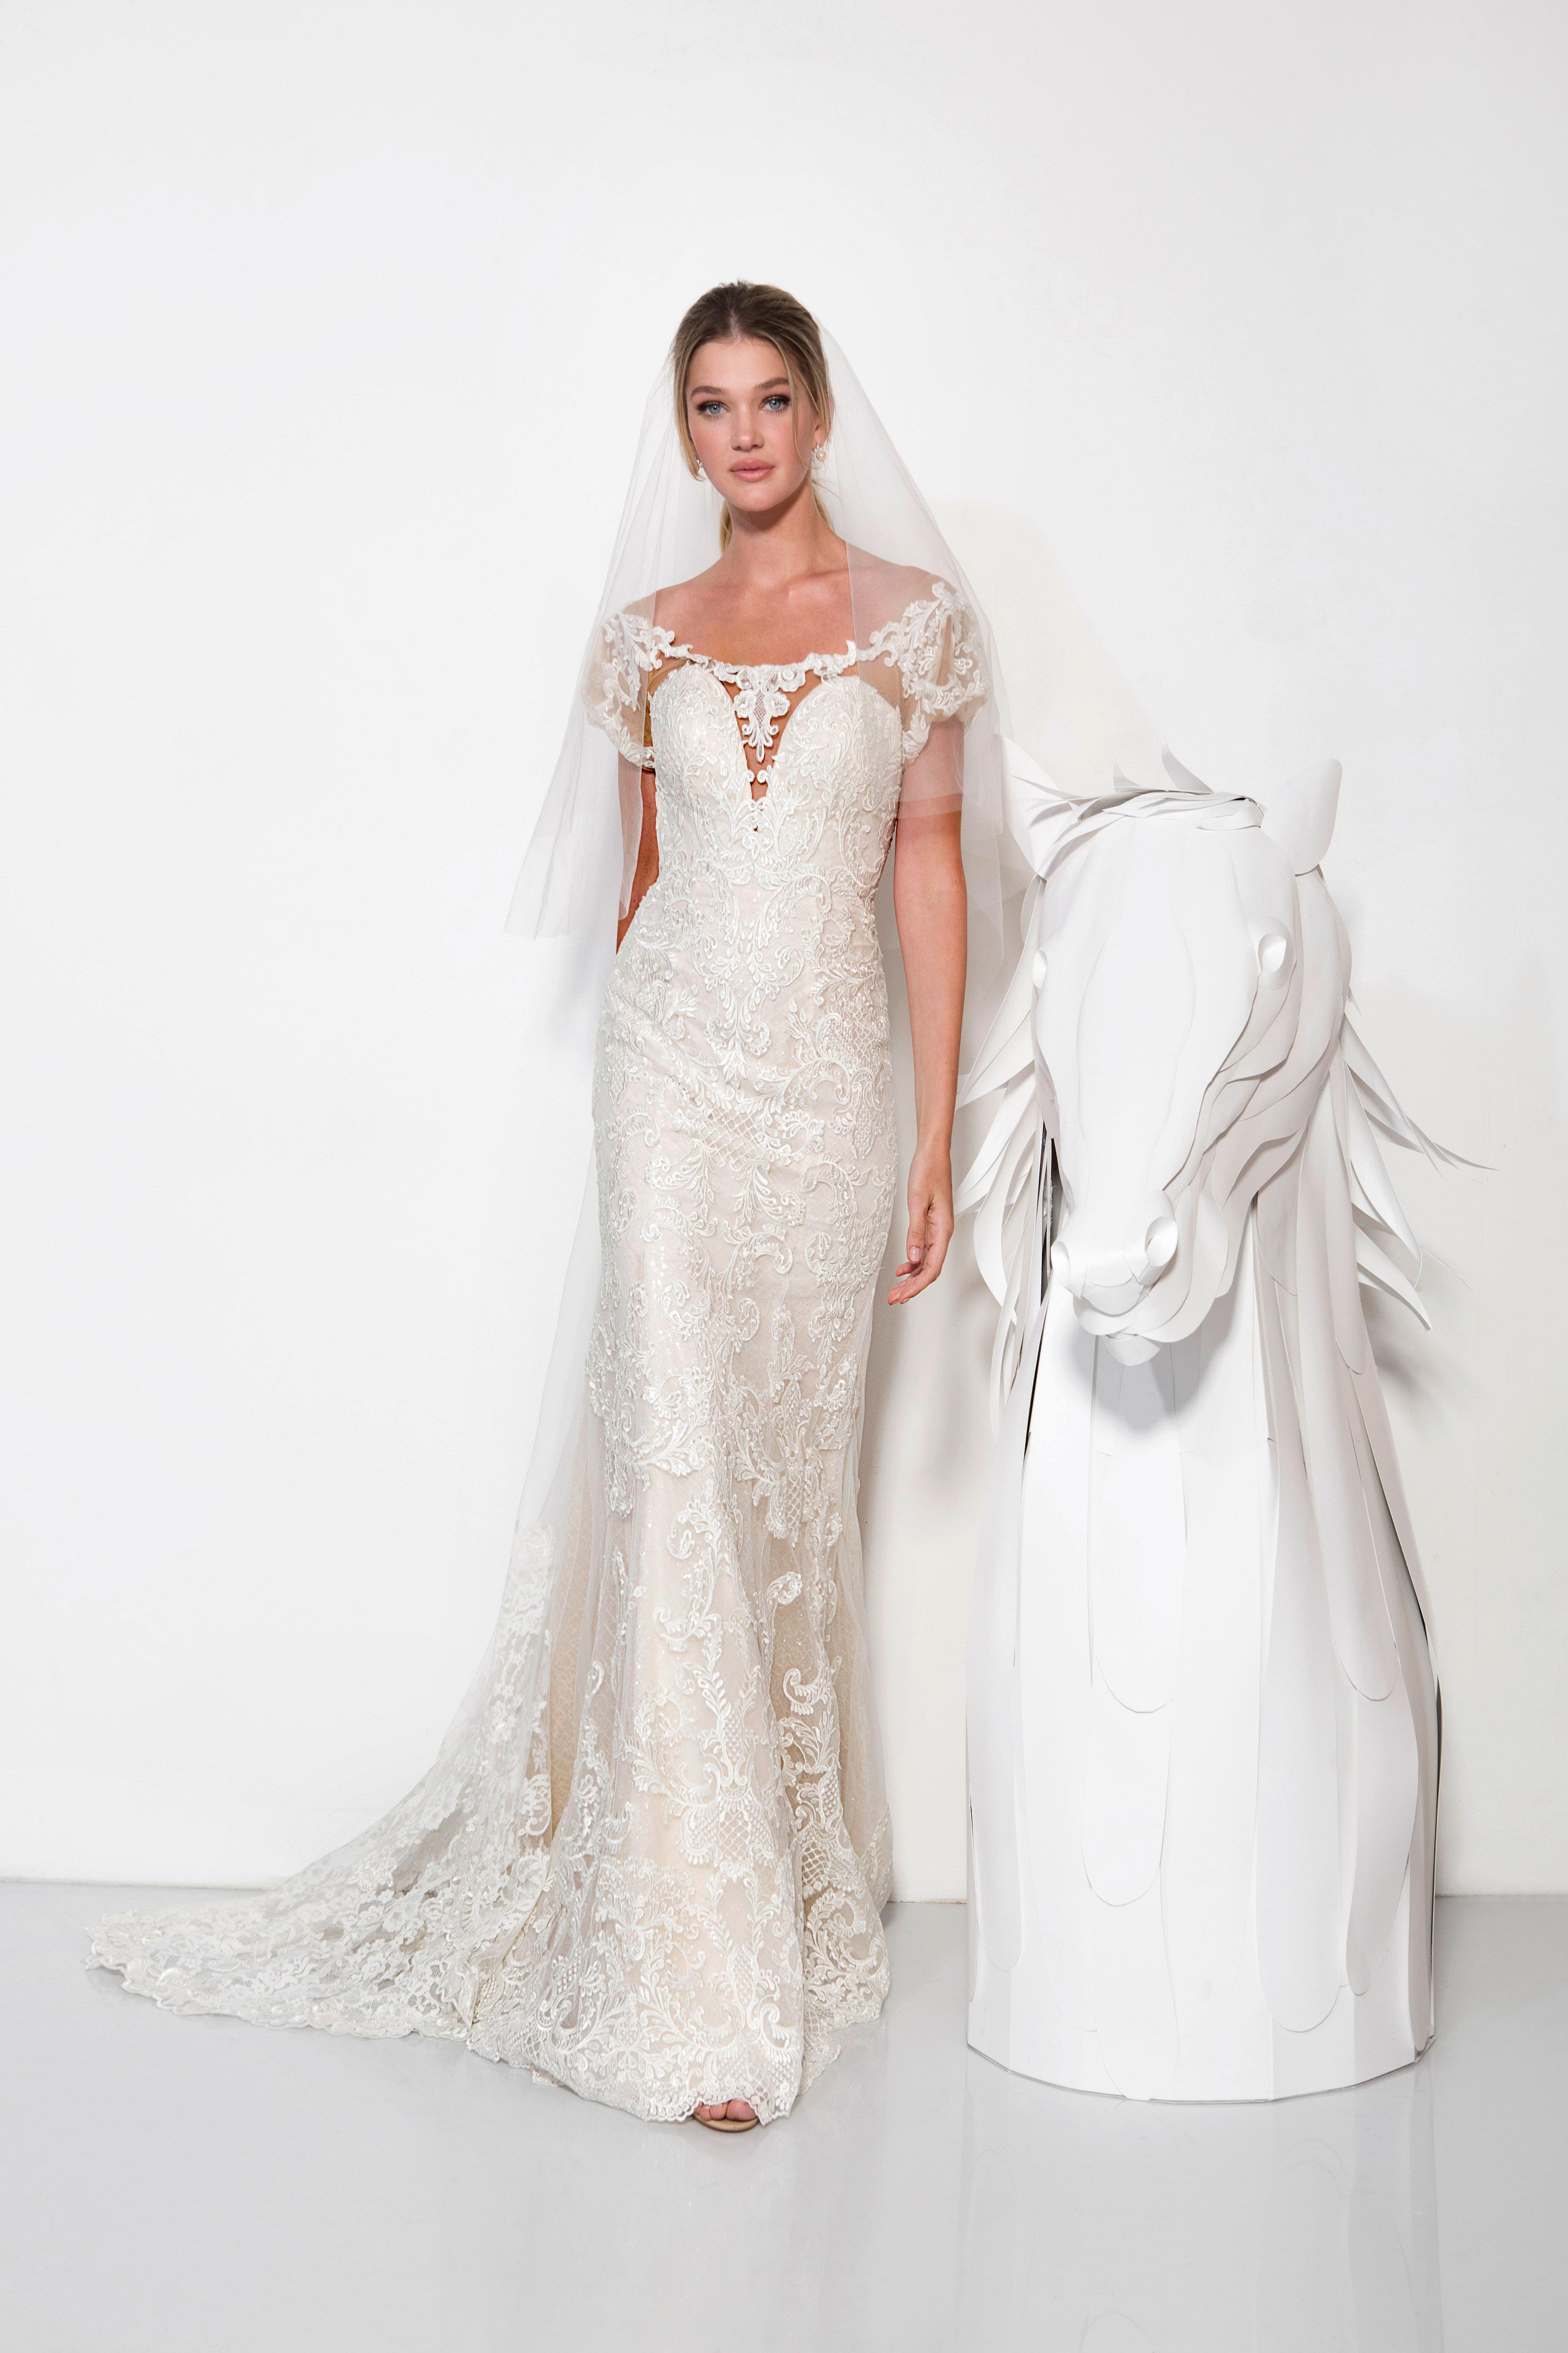 lavish by yaniv persy wedding dress spring 2019 wide neck short sleeves lace